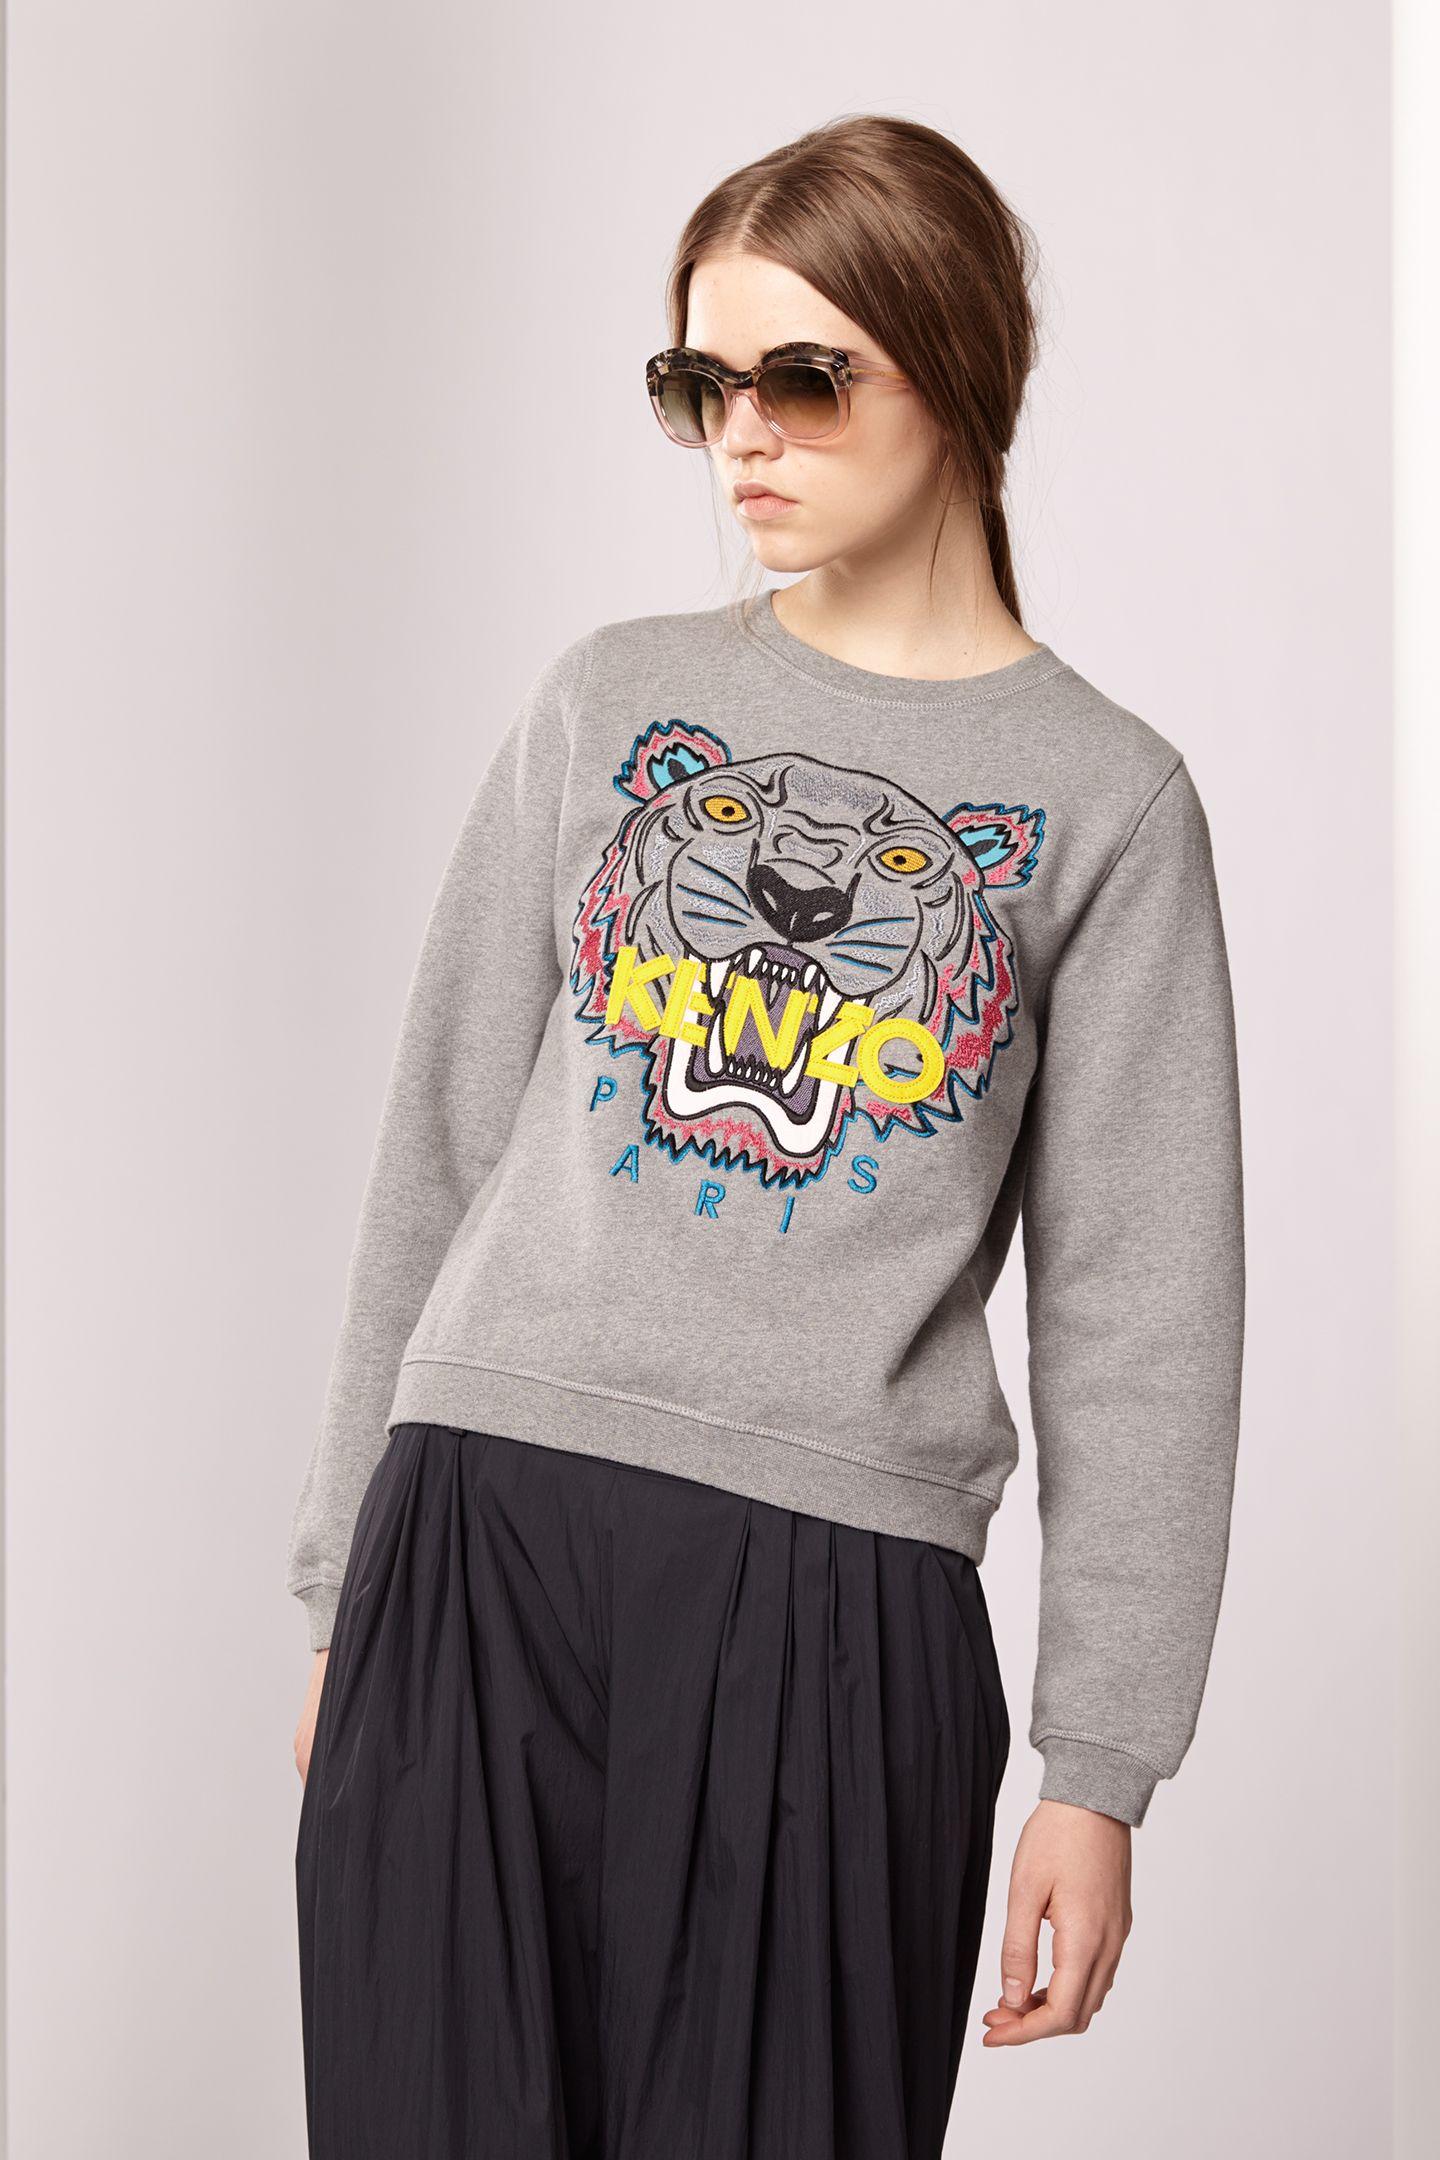 Kenzo Womens Tiger sweatshirt - Kenzo FW13 Icons Women - Kenzo E-shop a3ff2ffc24